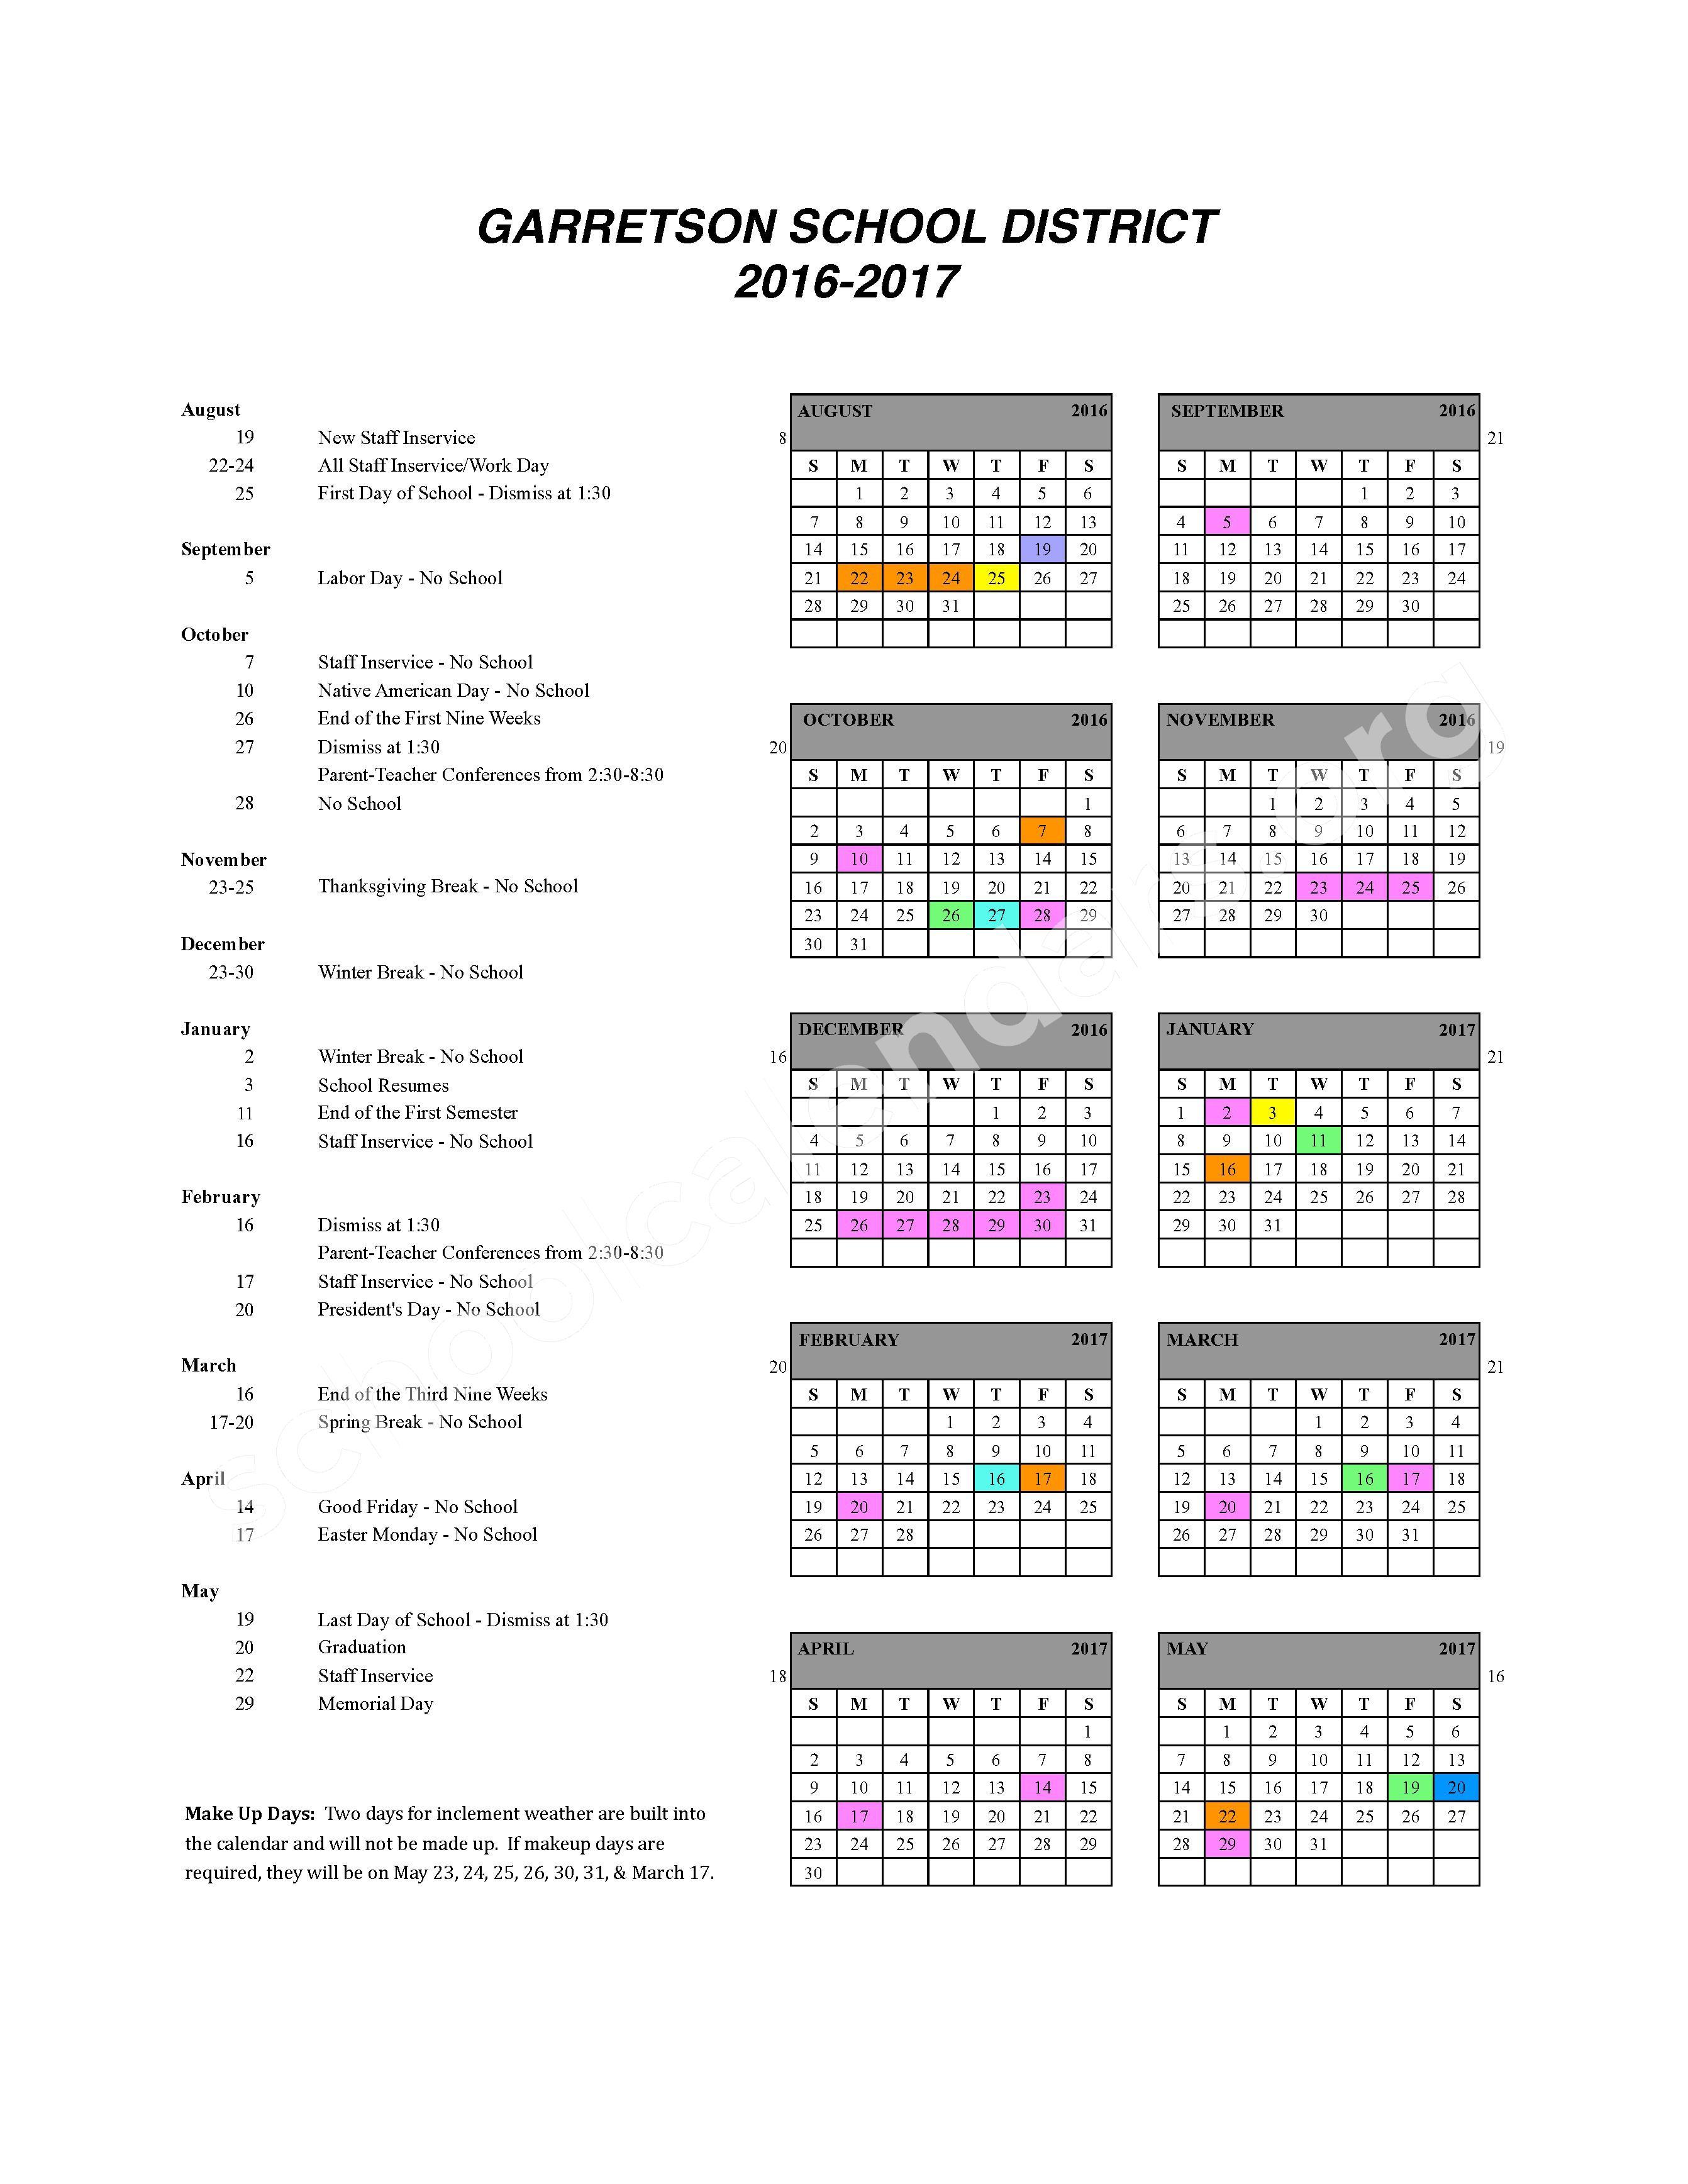 2016 - 2017 School Calendar – Garretson School District 49-4 – page 1